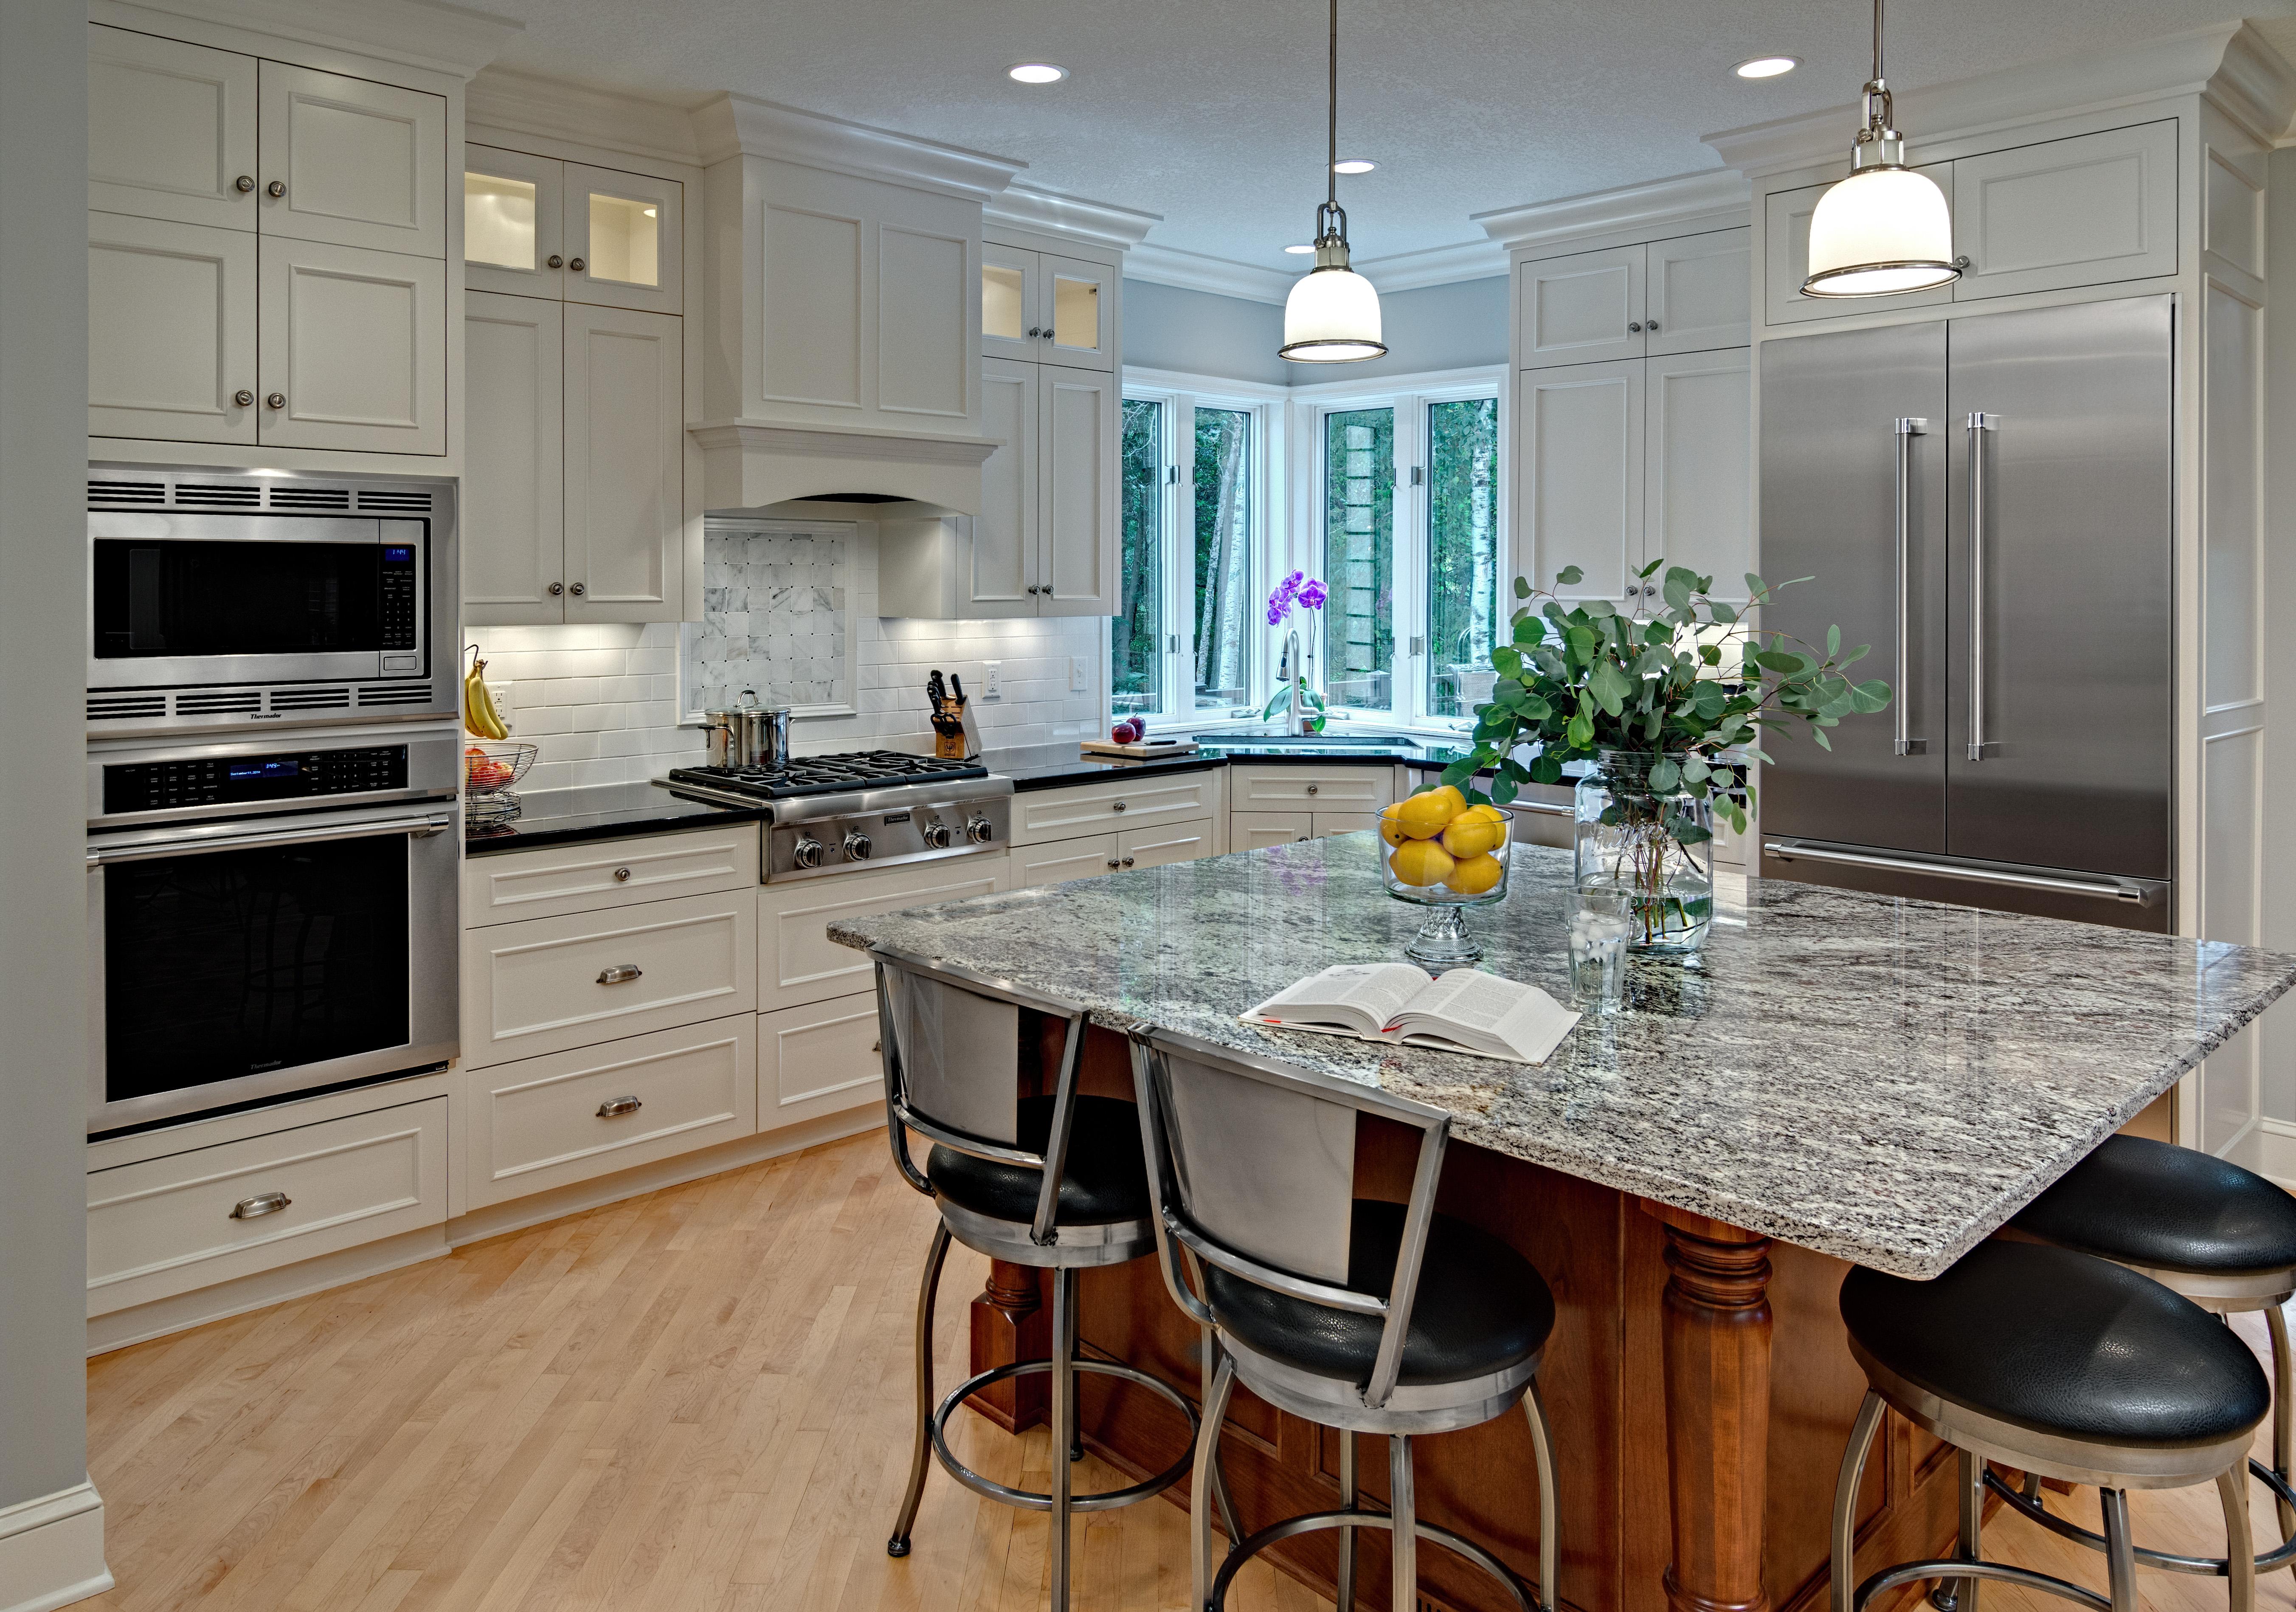 kitchens knight construction design inc. Black Bedroom Furniture Sets. Home Design Ideas